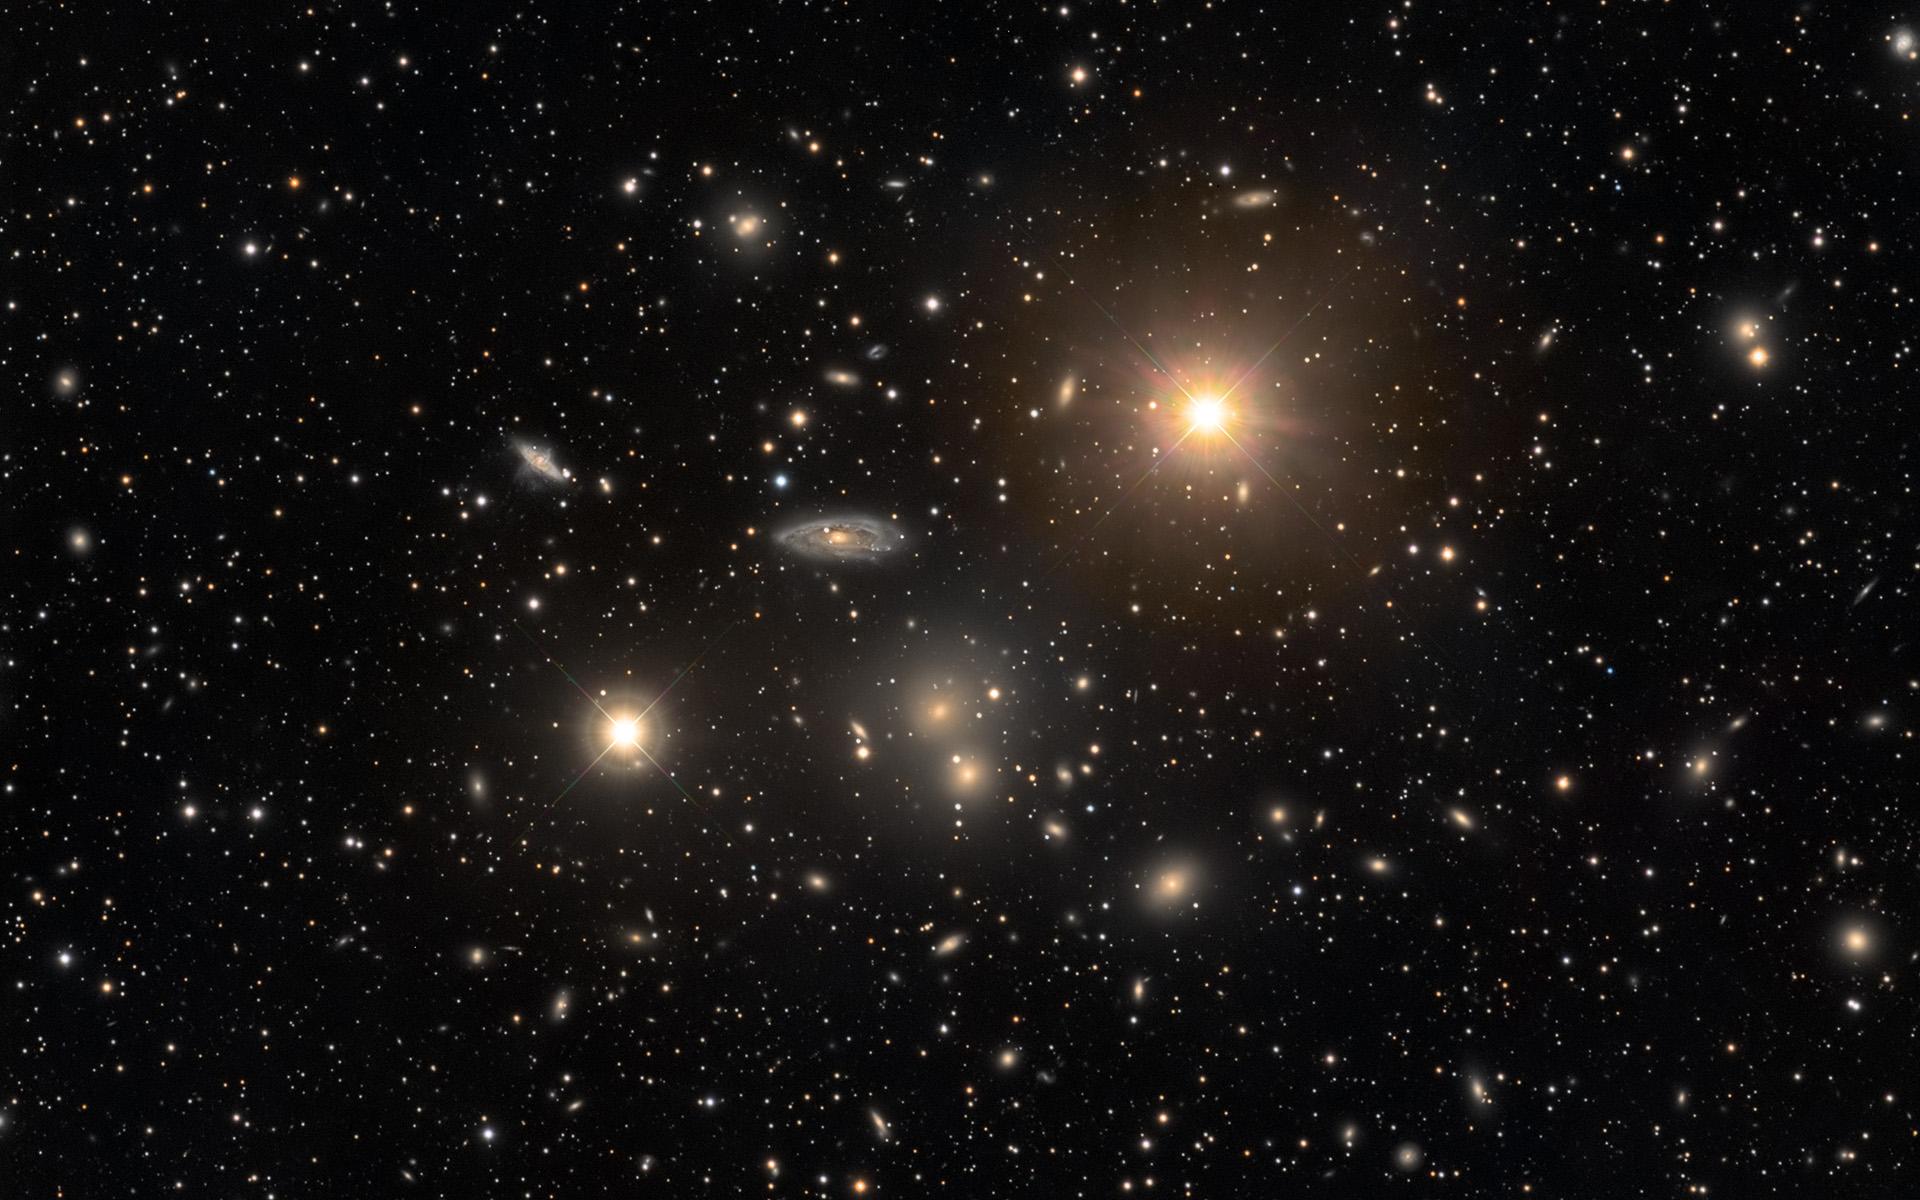 milky way galaxy cluster - photo #13